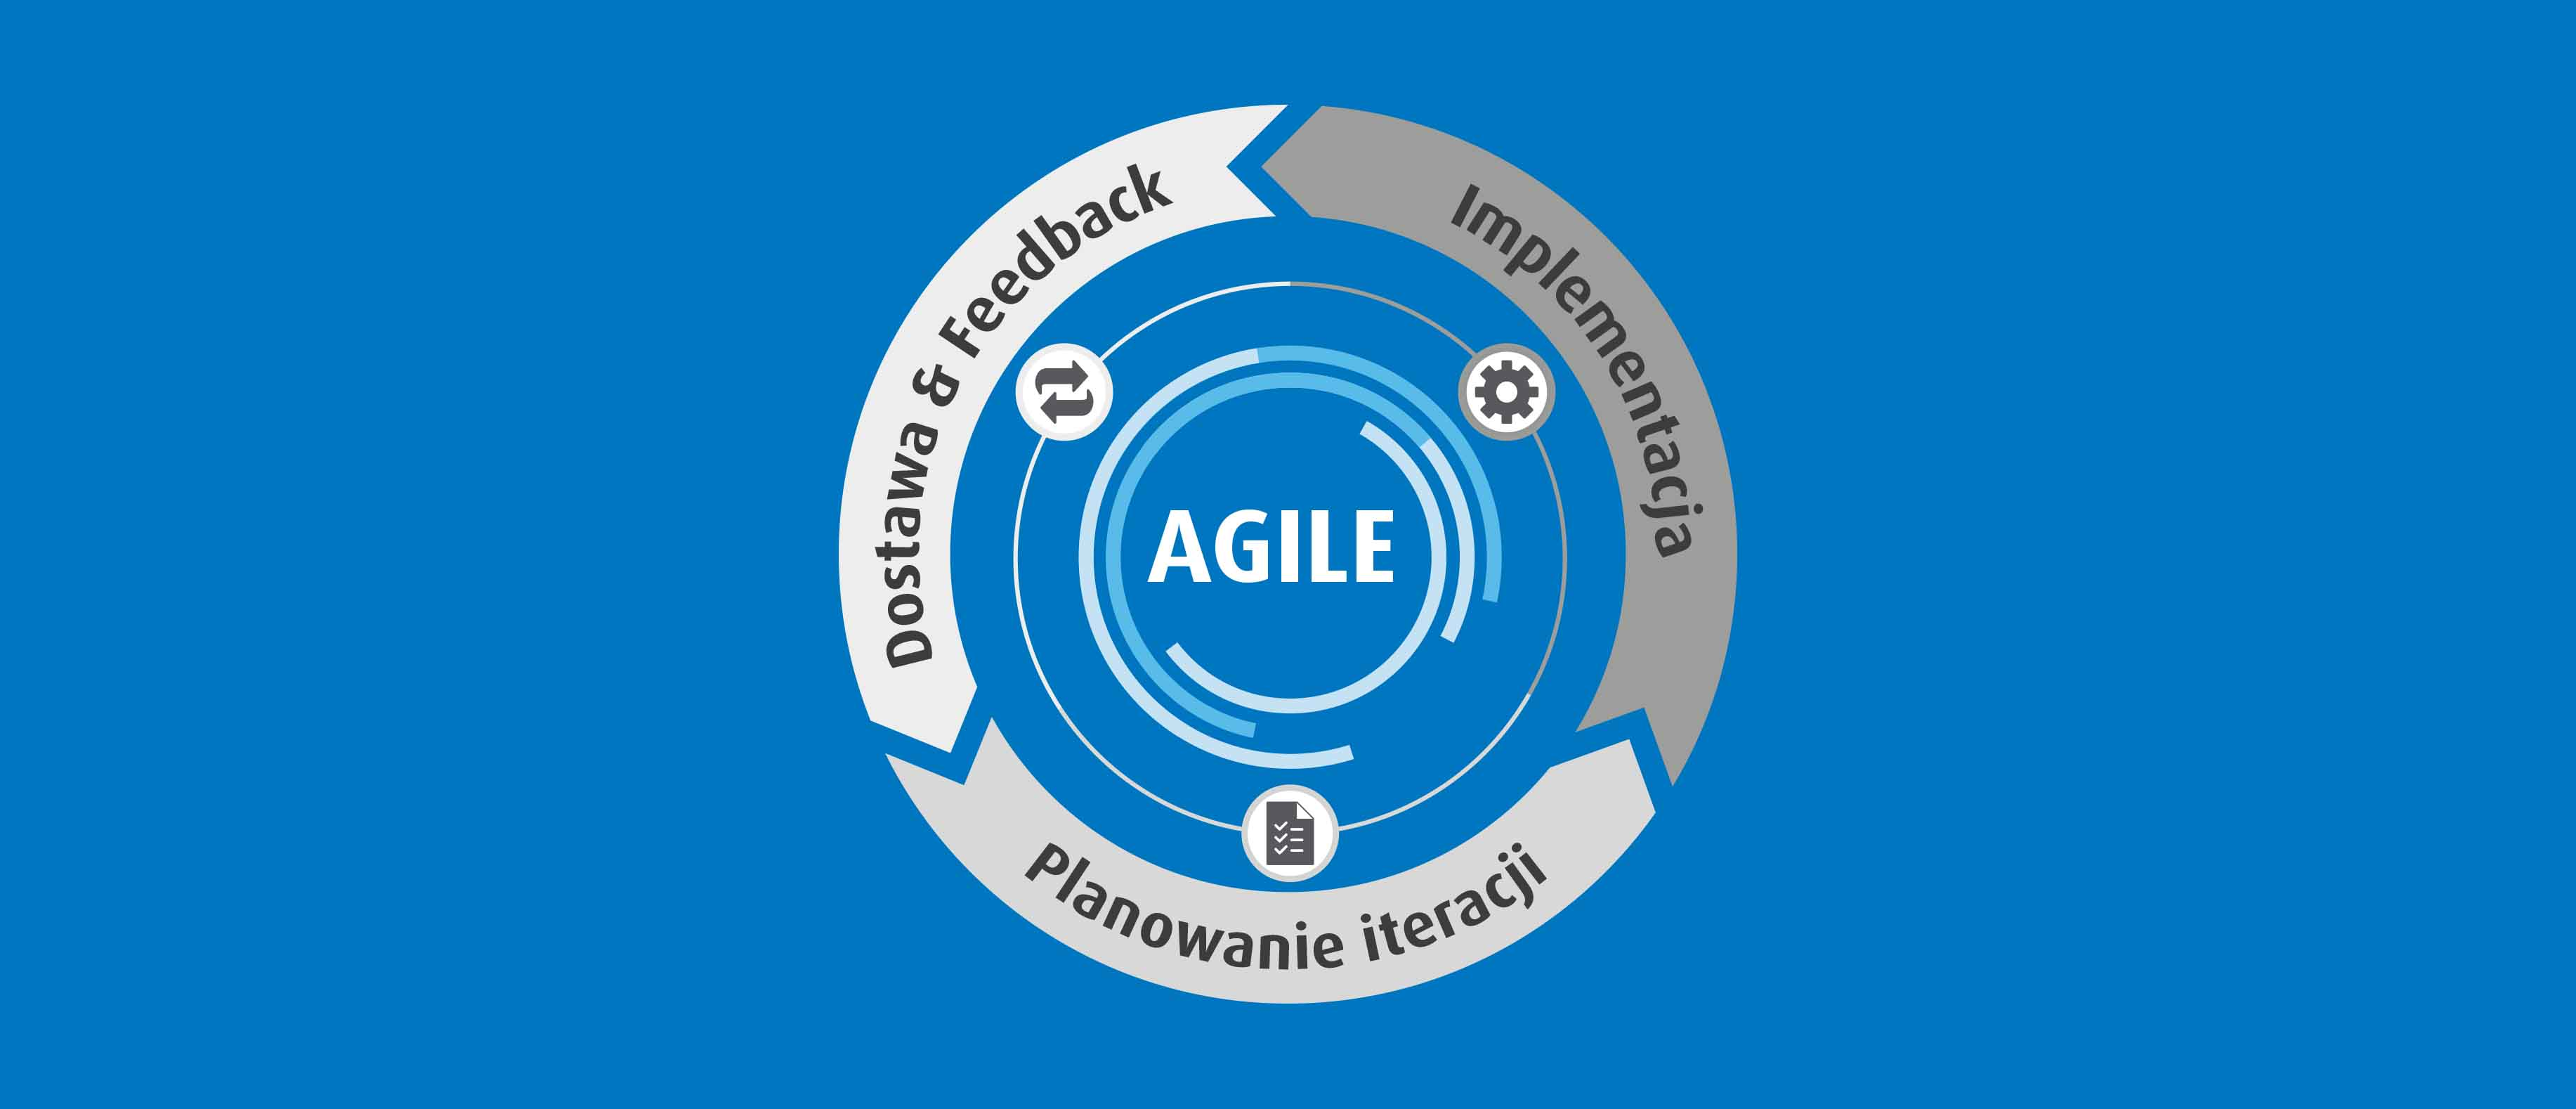 JCommerce-Etapy-Agile-podejscie-zwinne